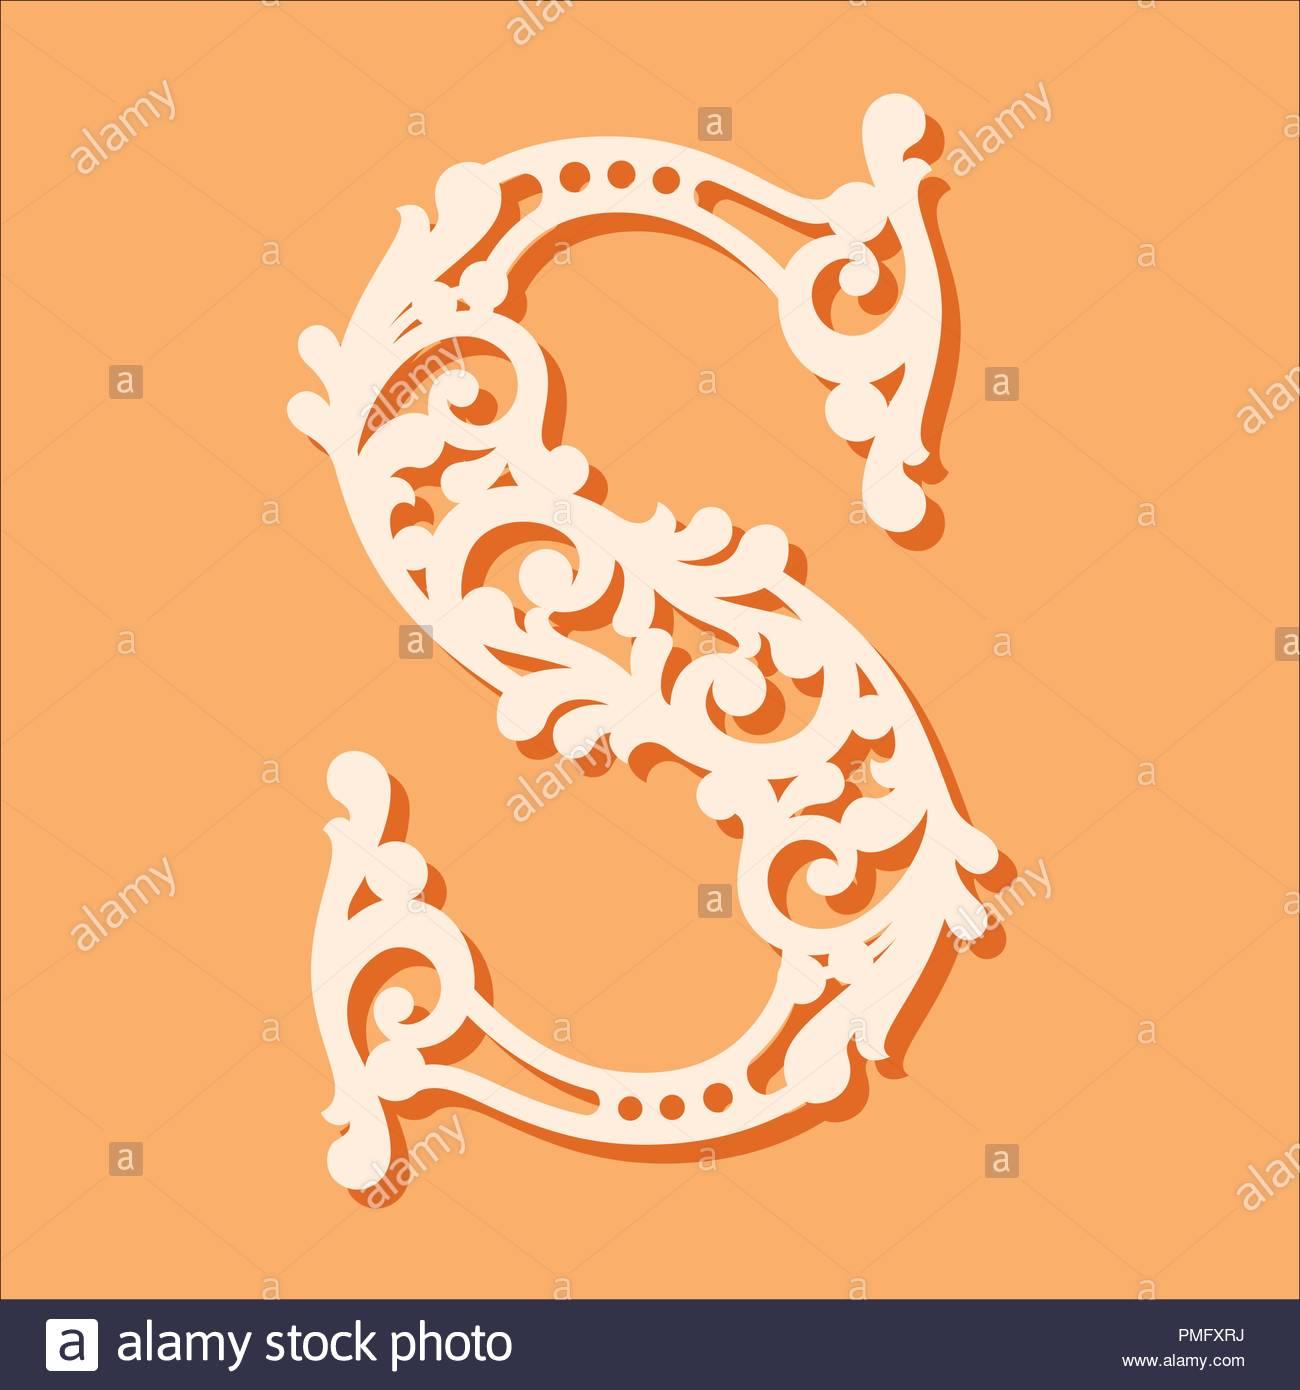 Cutting Letter Alphabet Worksheet